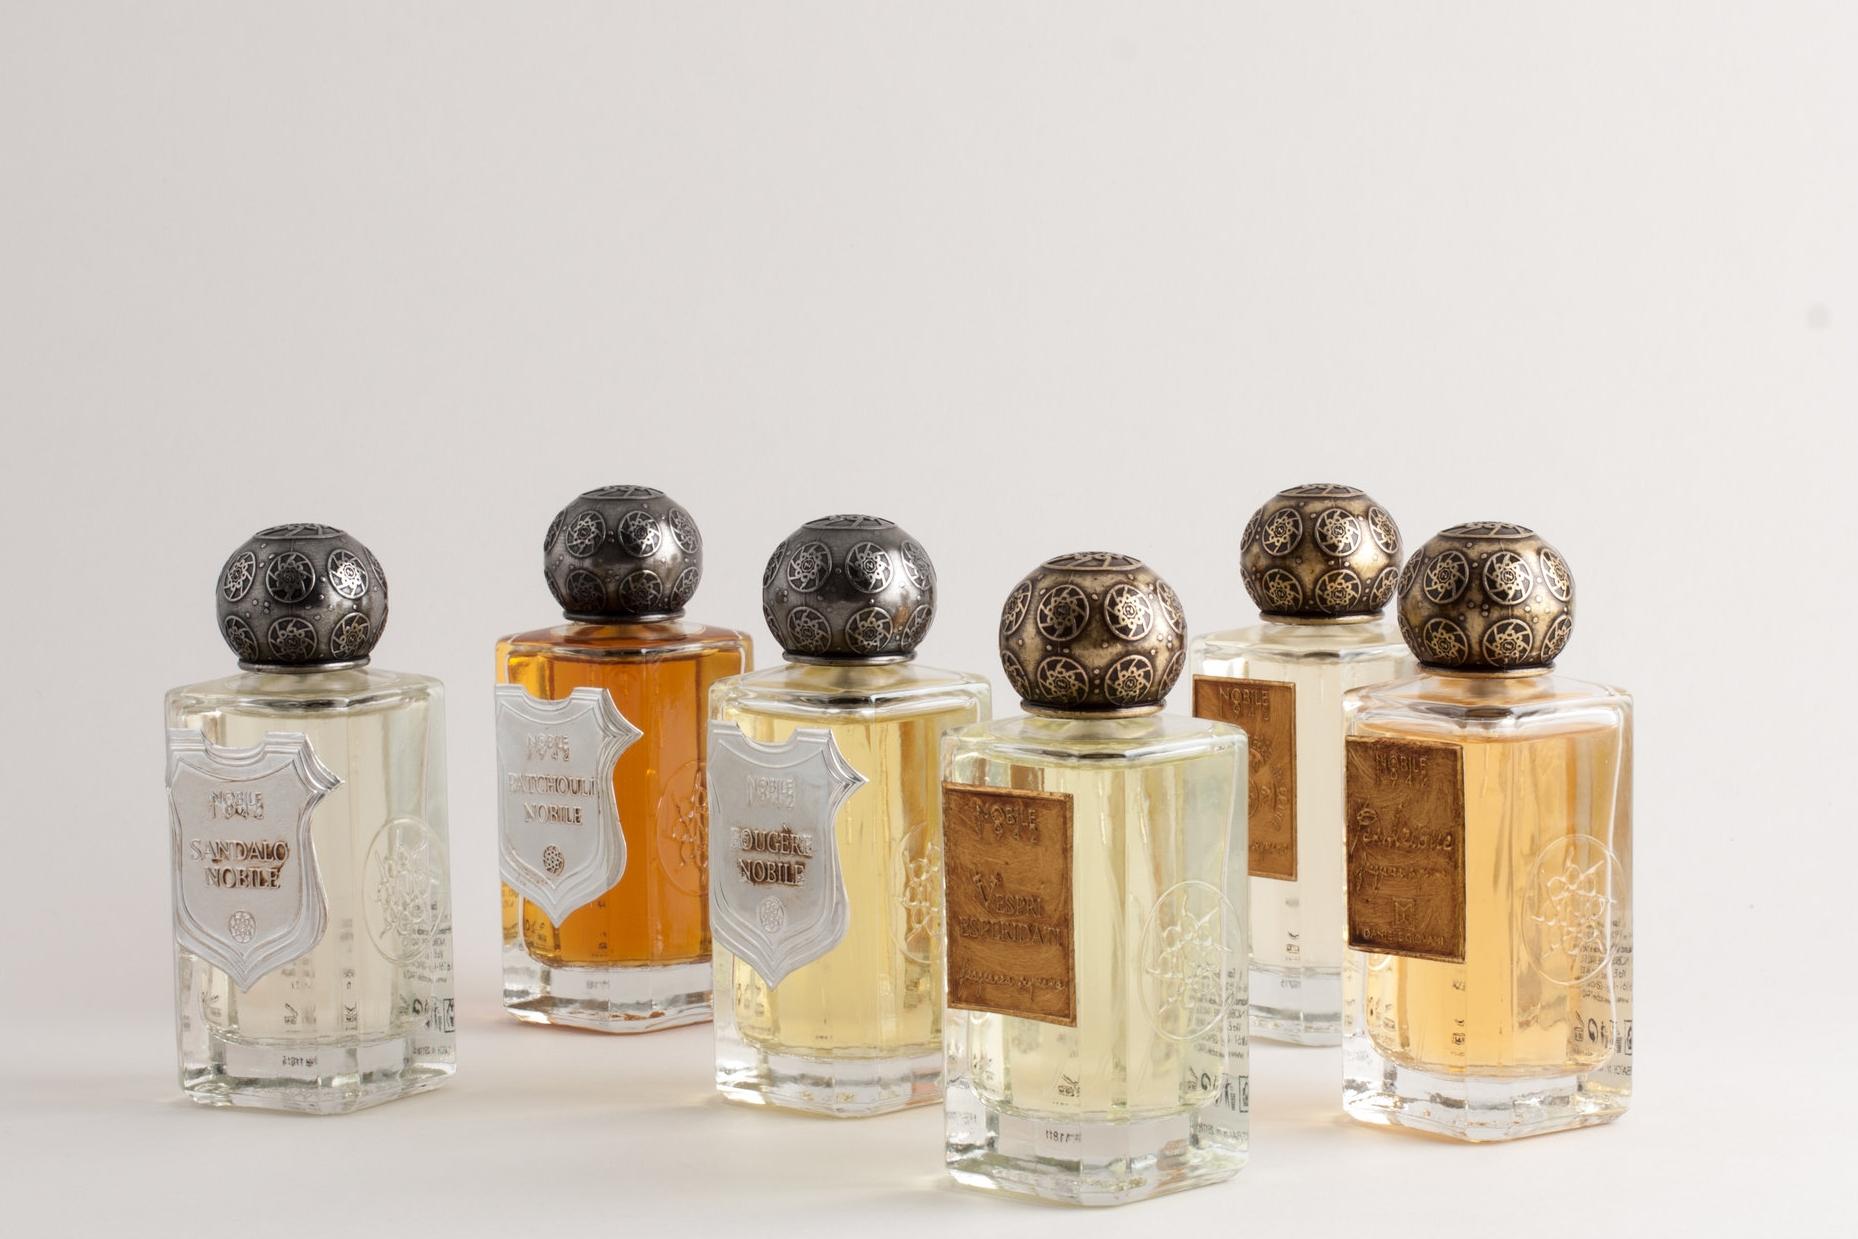 Nobile-1942 at H Parfums